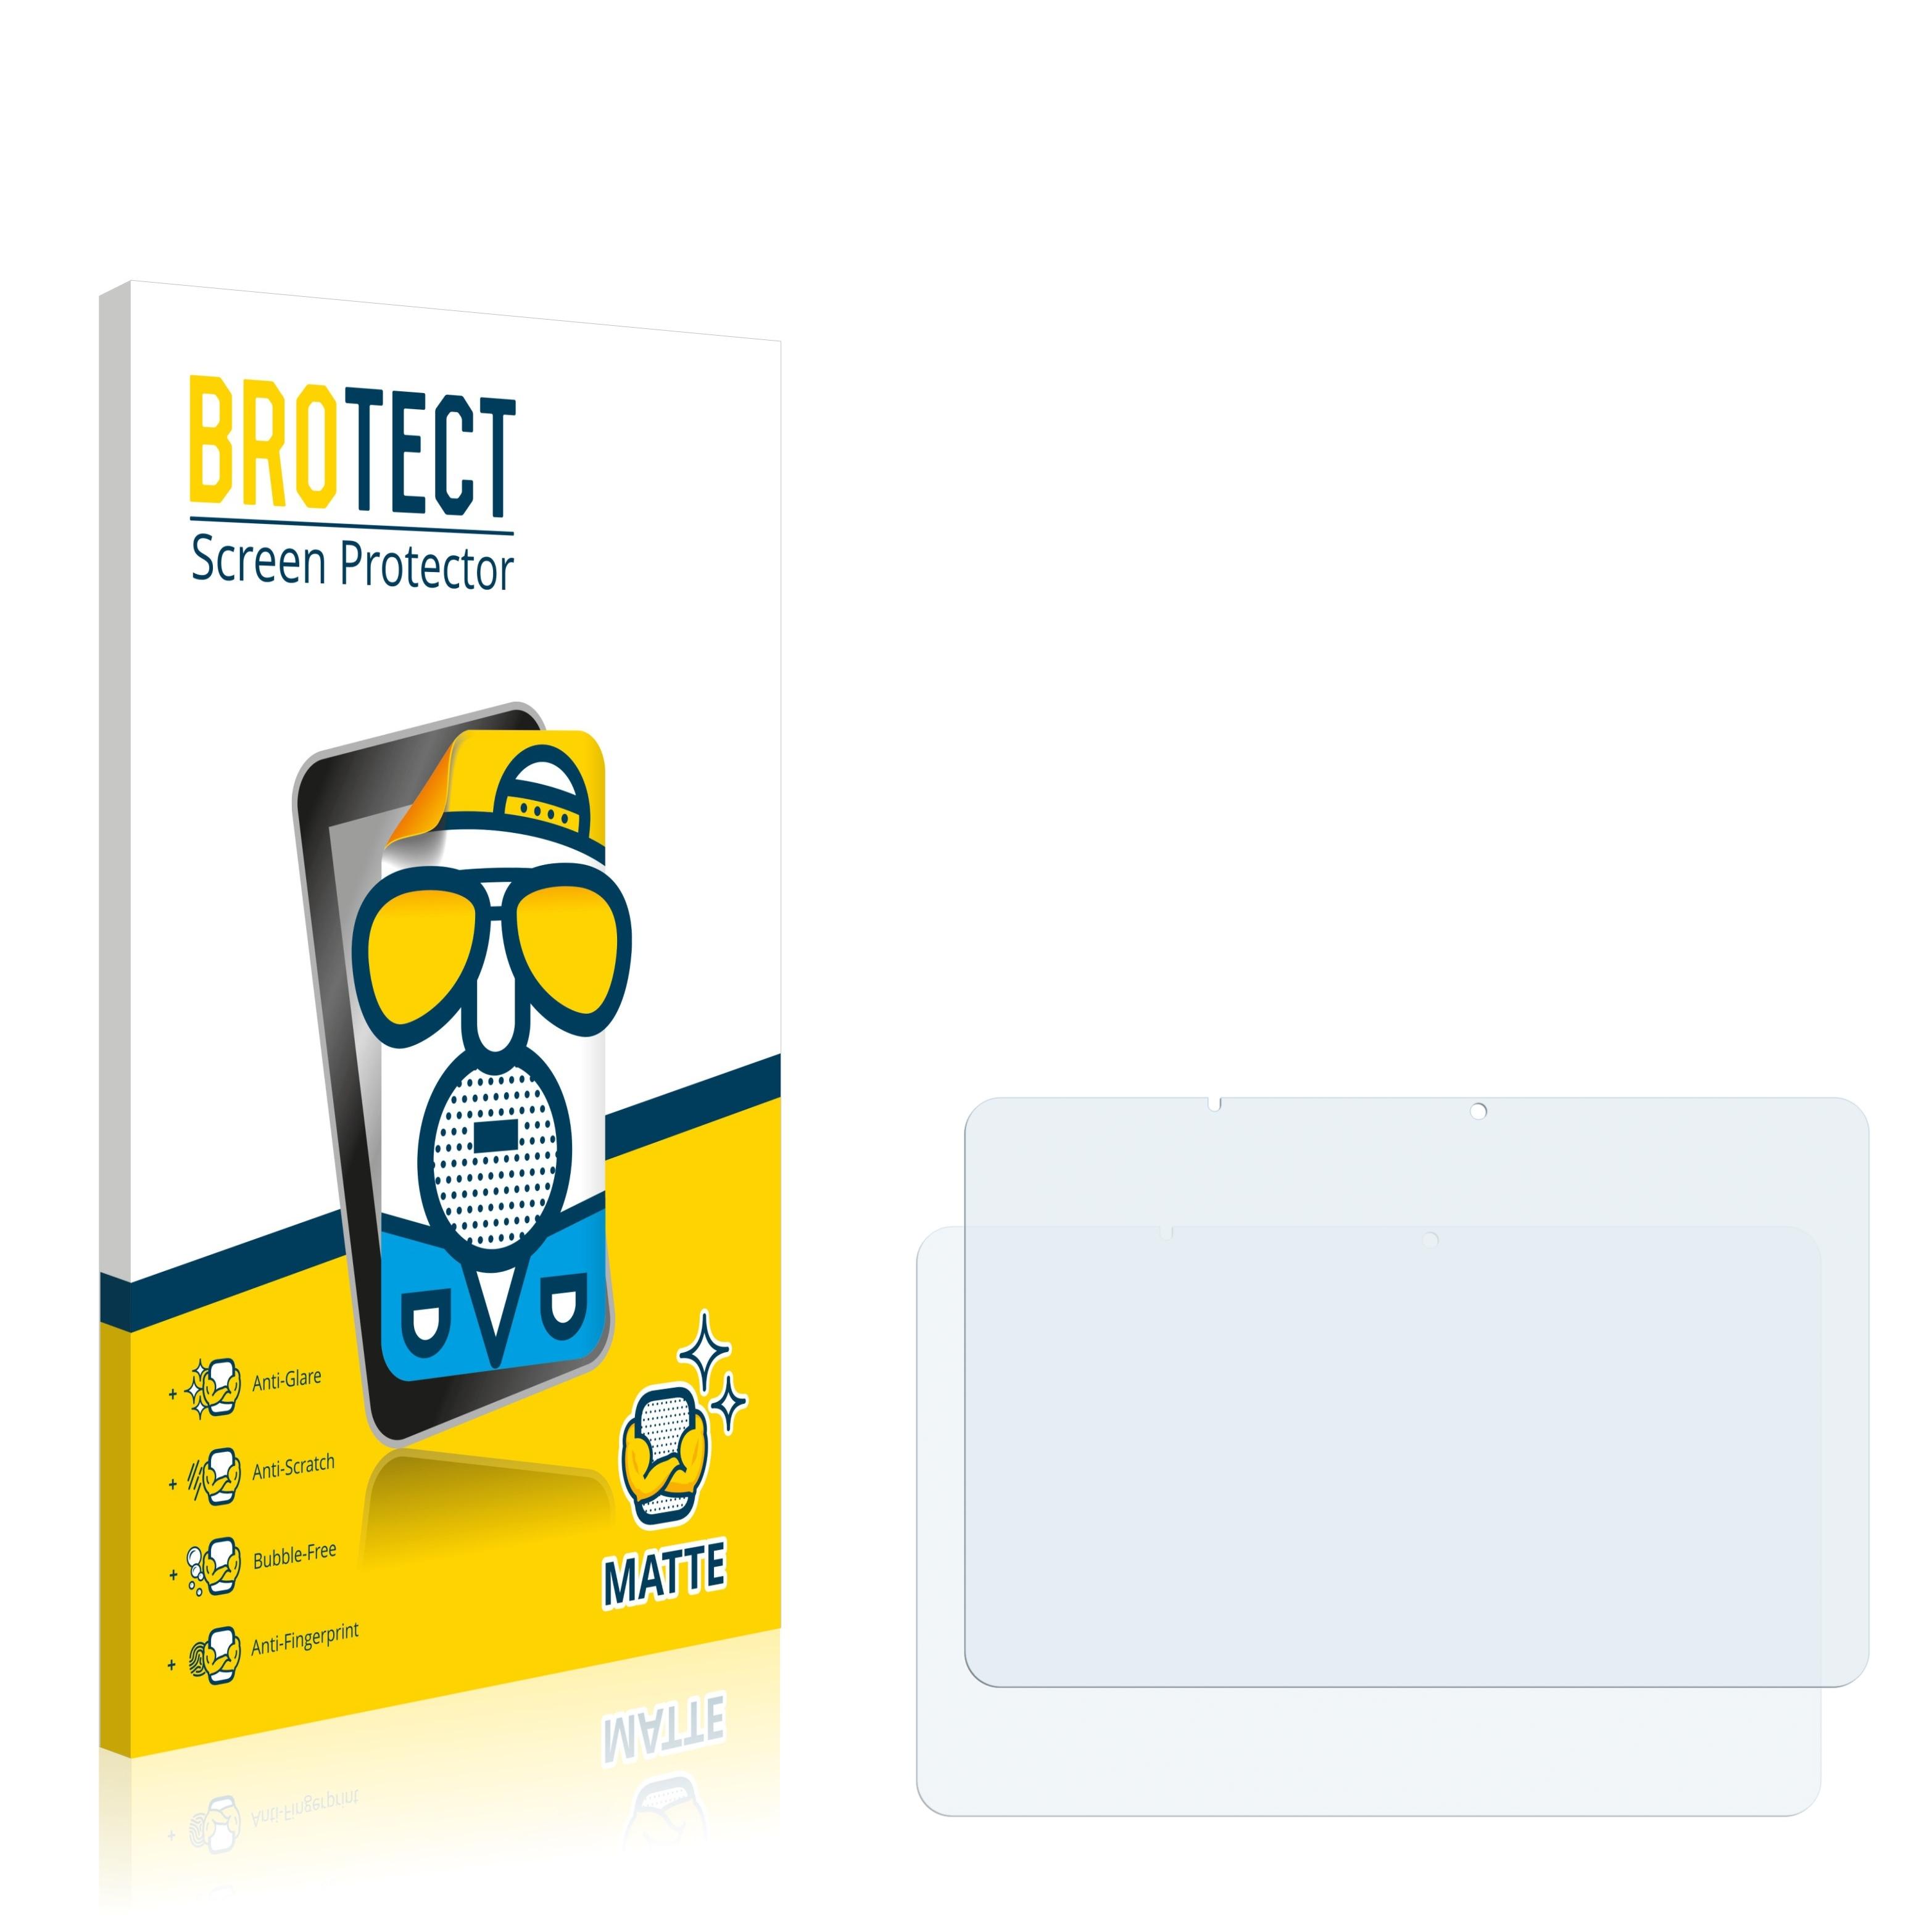 Matná ochranná fólie BROTECT pro Acer Iconia Tab A701, 2 ks